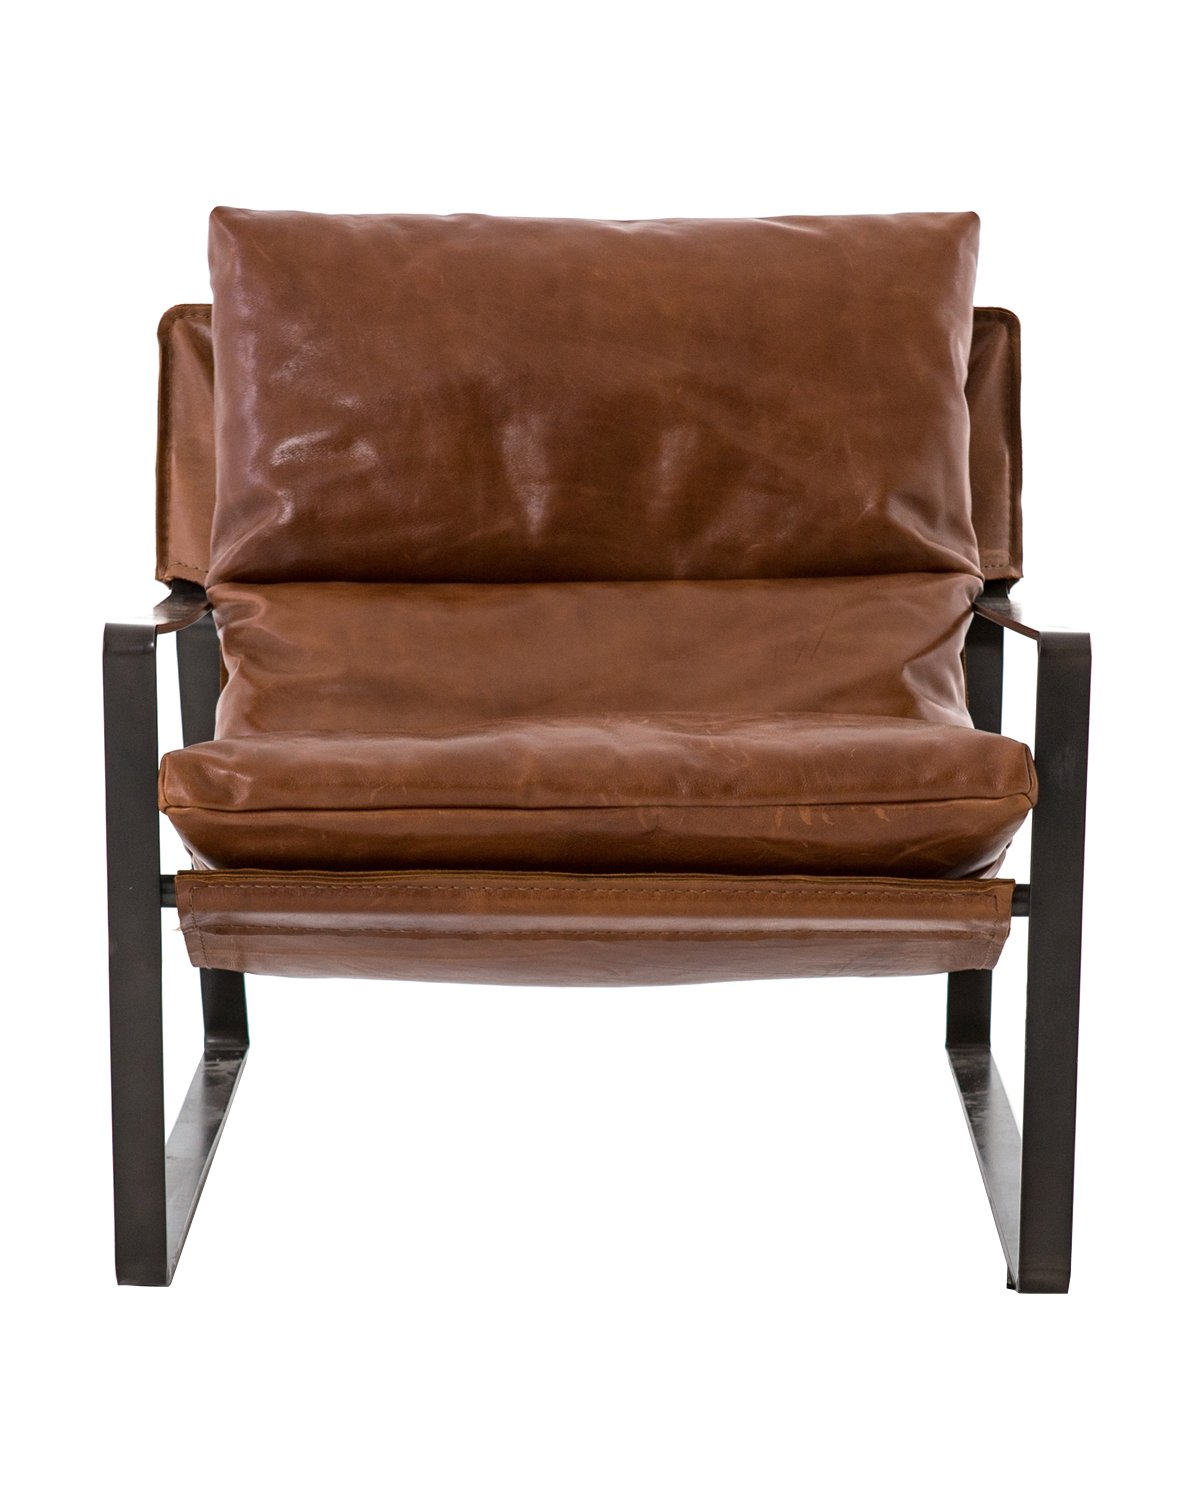 Peyton_Chair_Tobbaco_3_3c2a30b0-1d30-4877-b0f9-db158929f28b (1).jpg